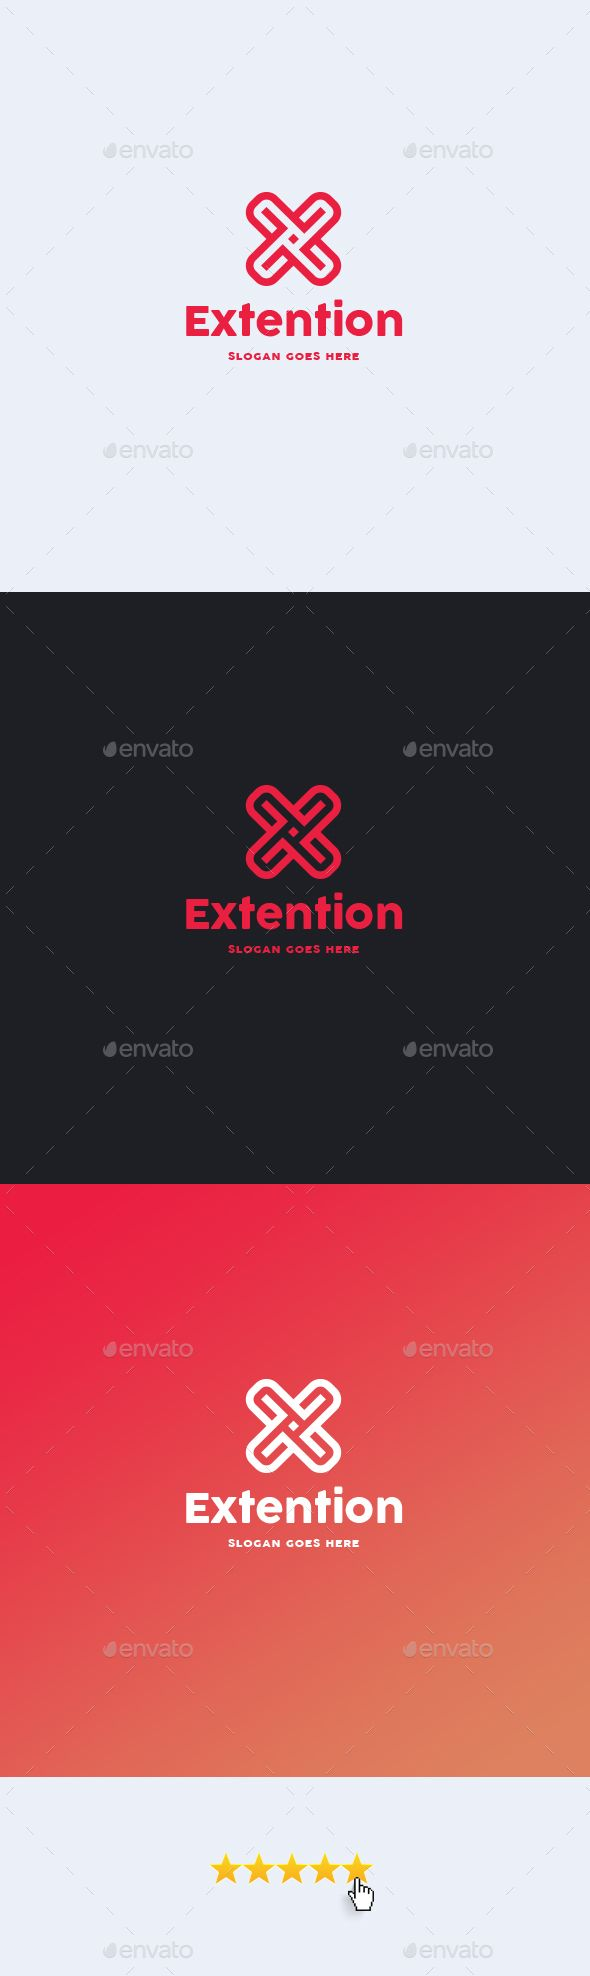 Logosmartz custom logo maker 5 0 review and download - Extention Letter X Logo Template